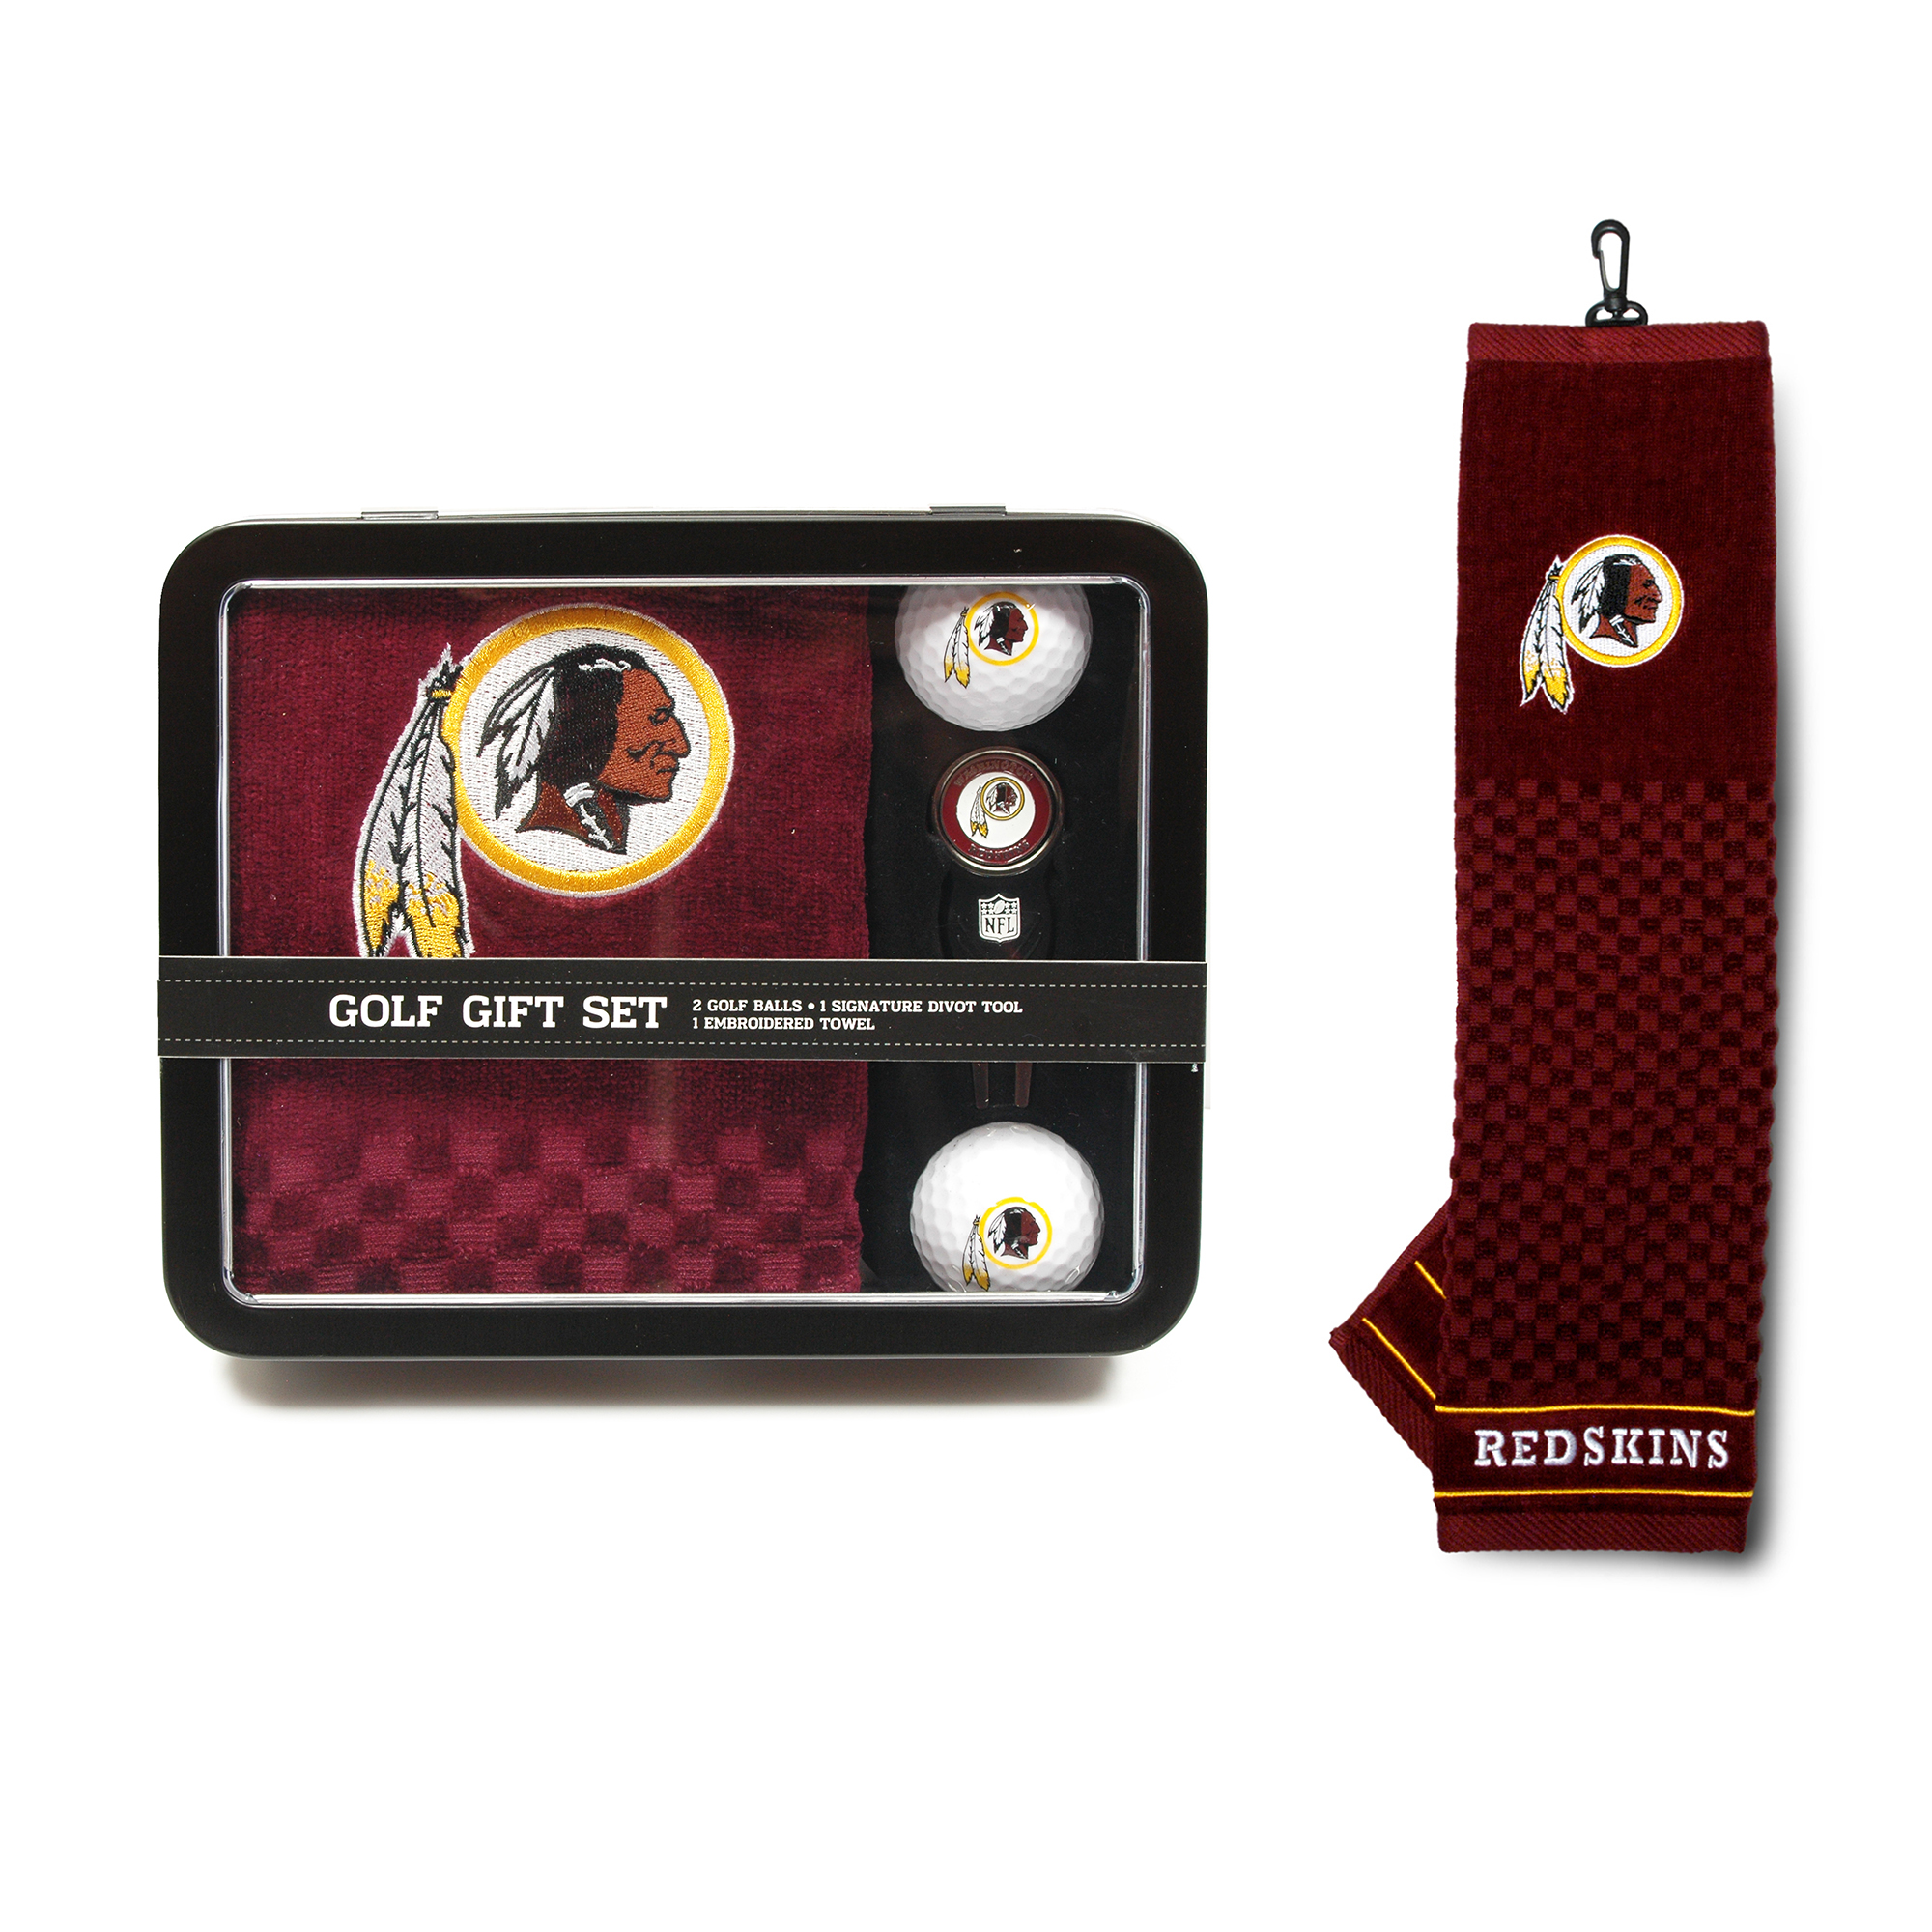 Washington Redskins Golf Gift Set with Towel